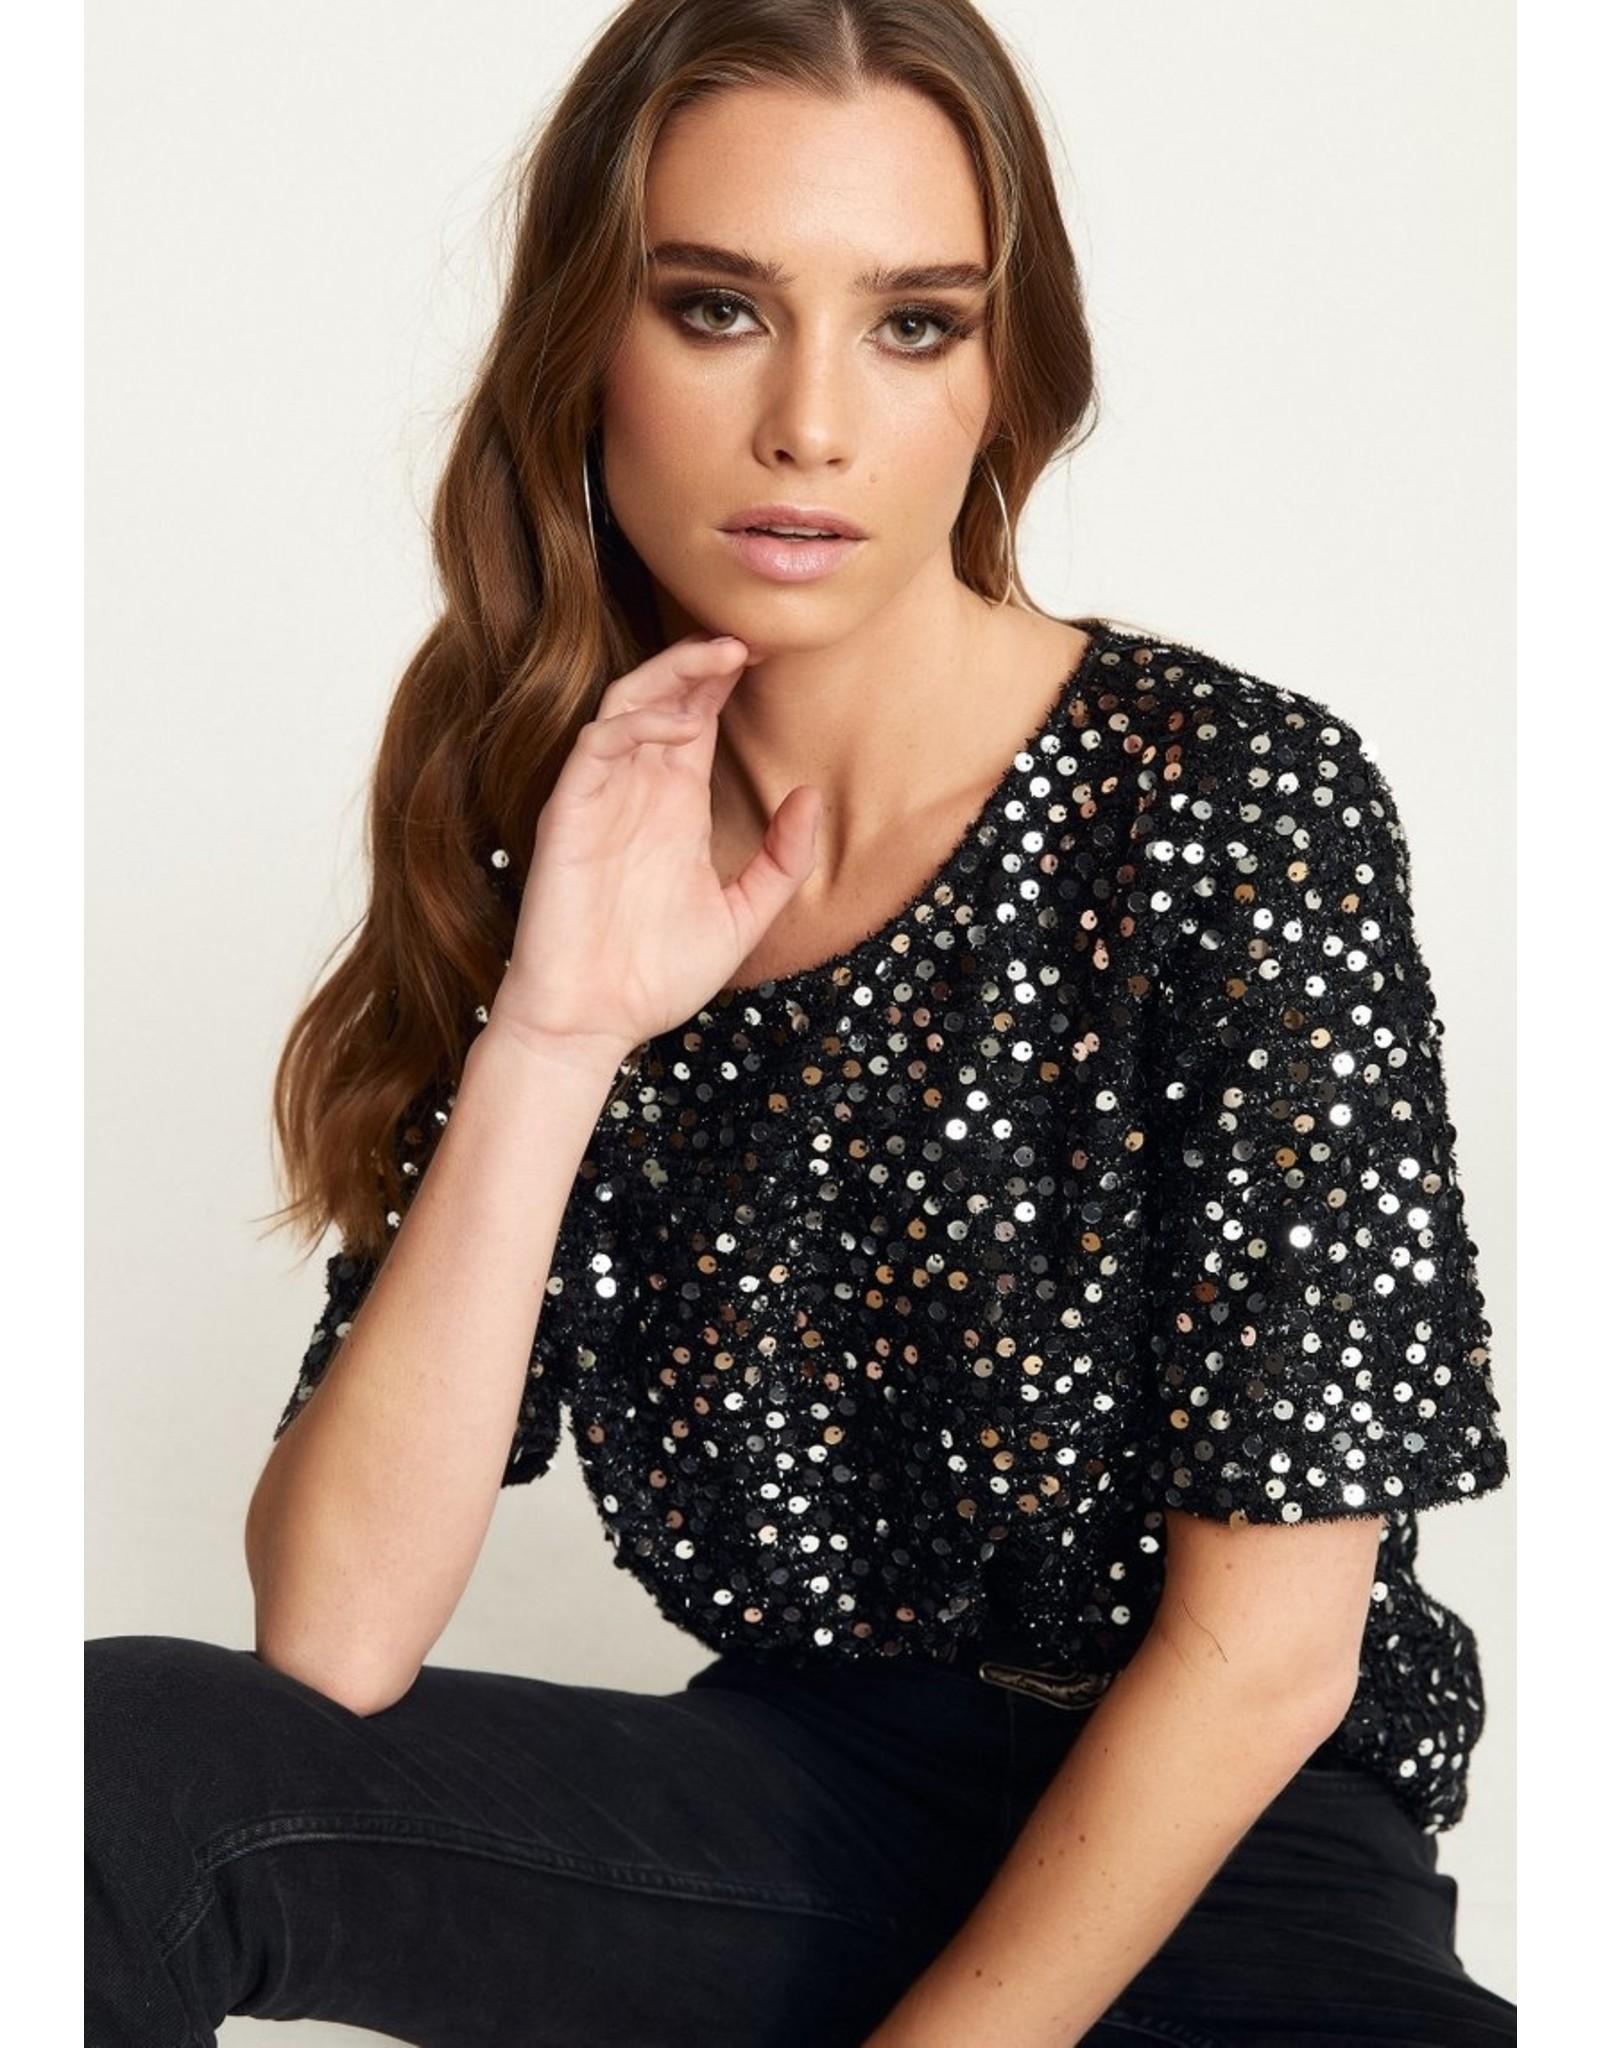 Vanessa Top Black/Silver Sequins